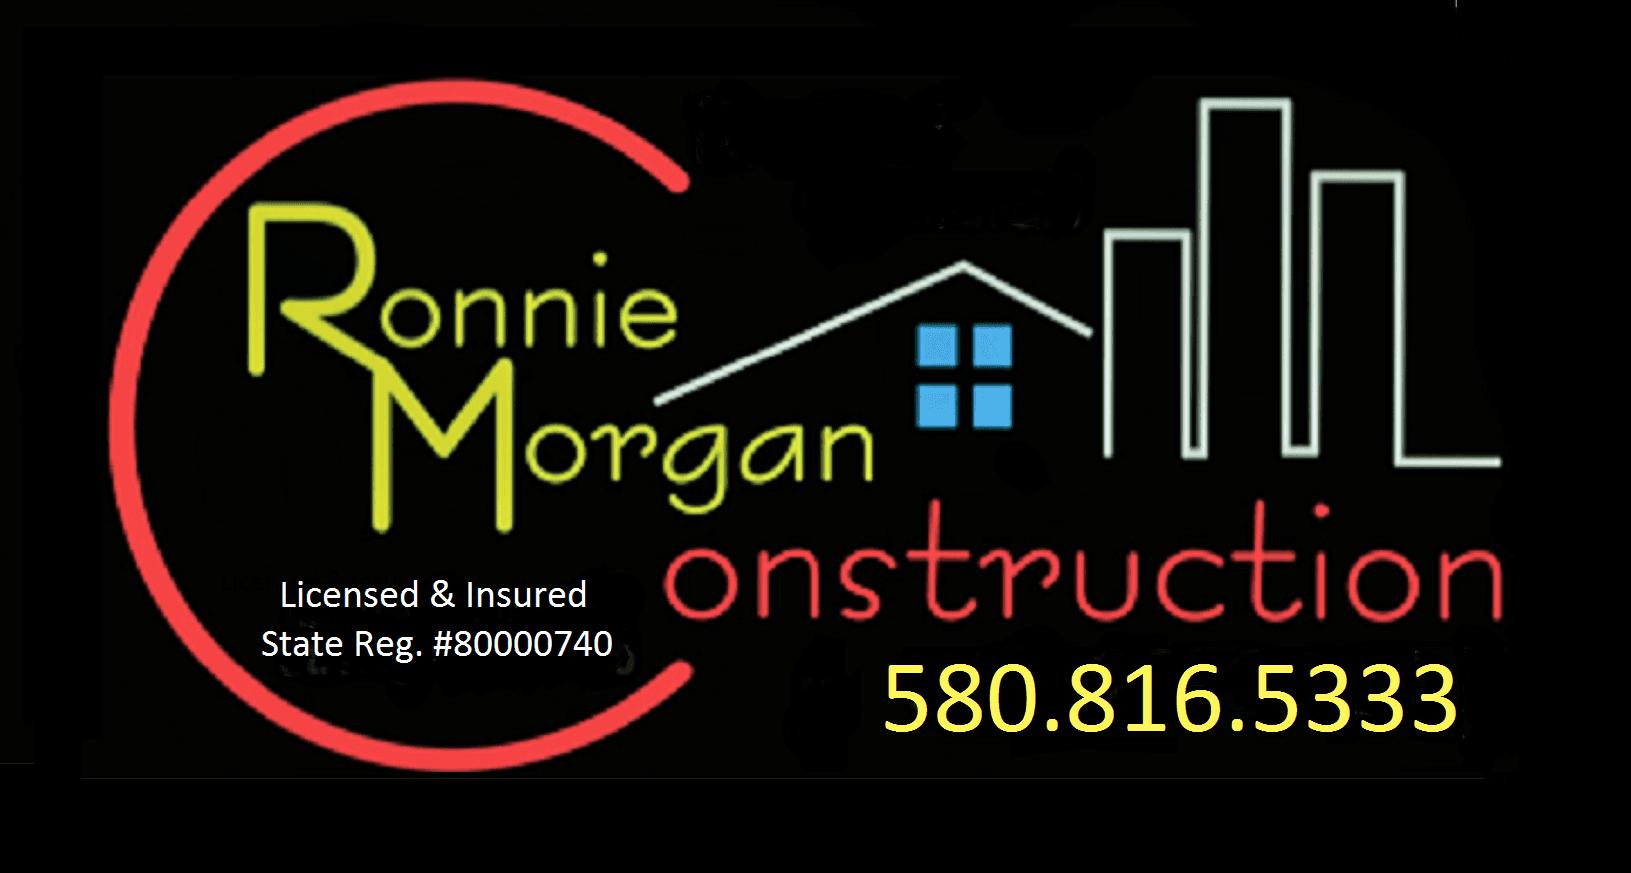 Ronnie Morgan Construction - logo